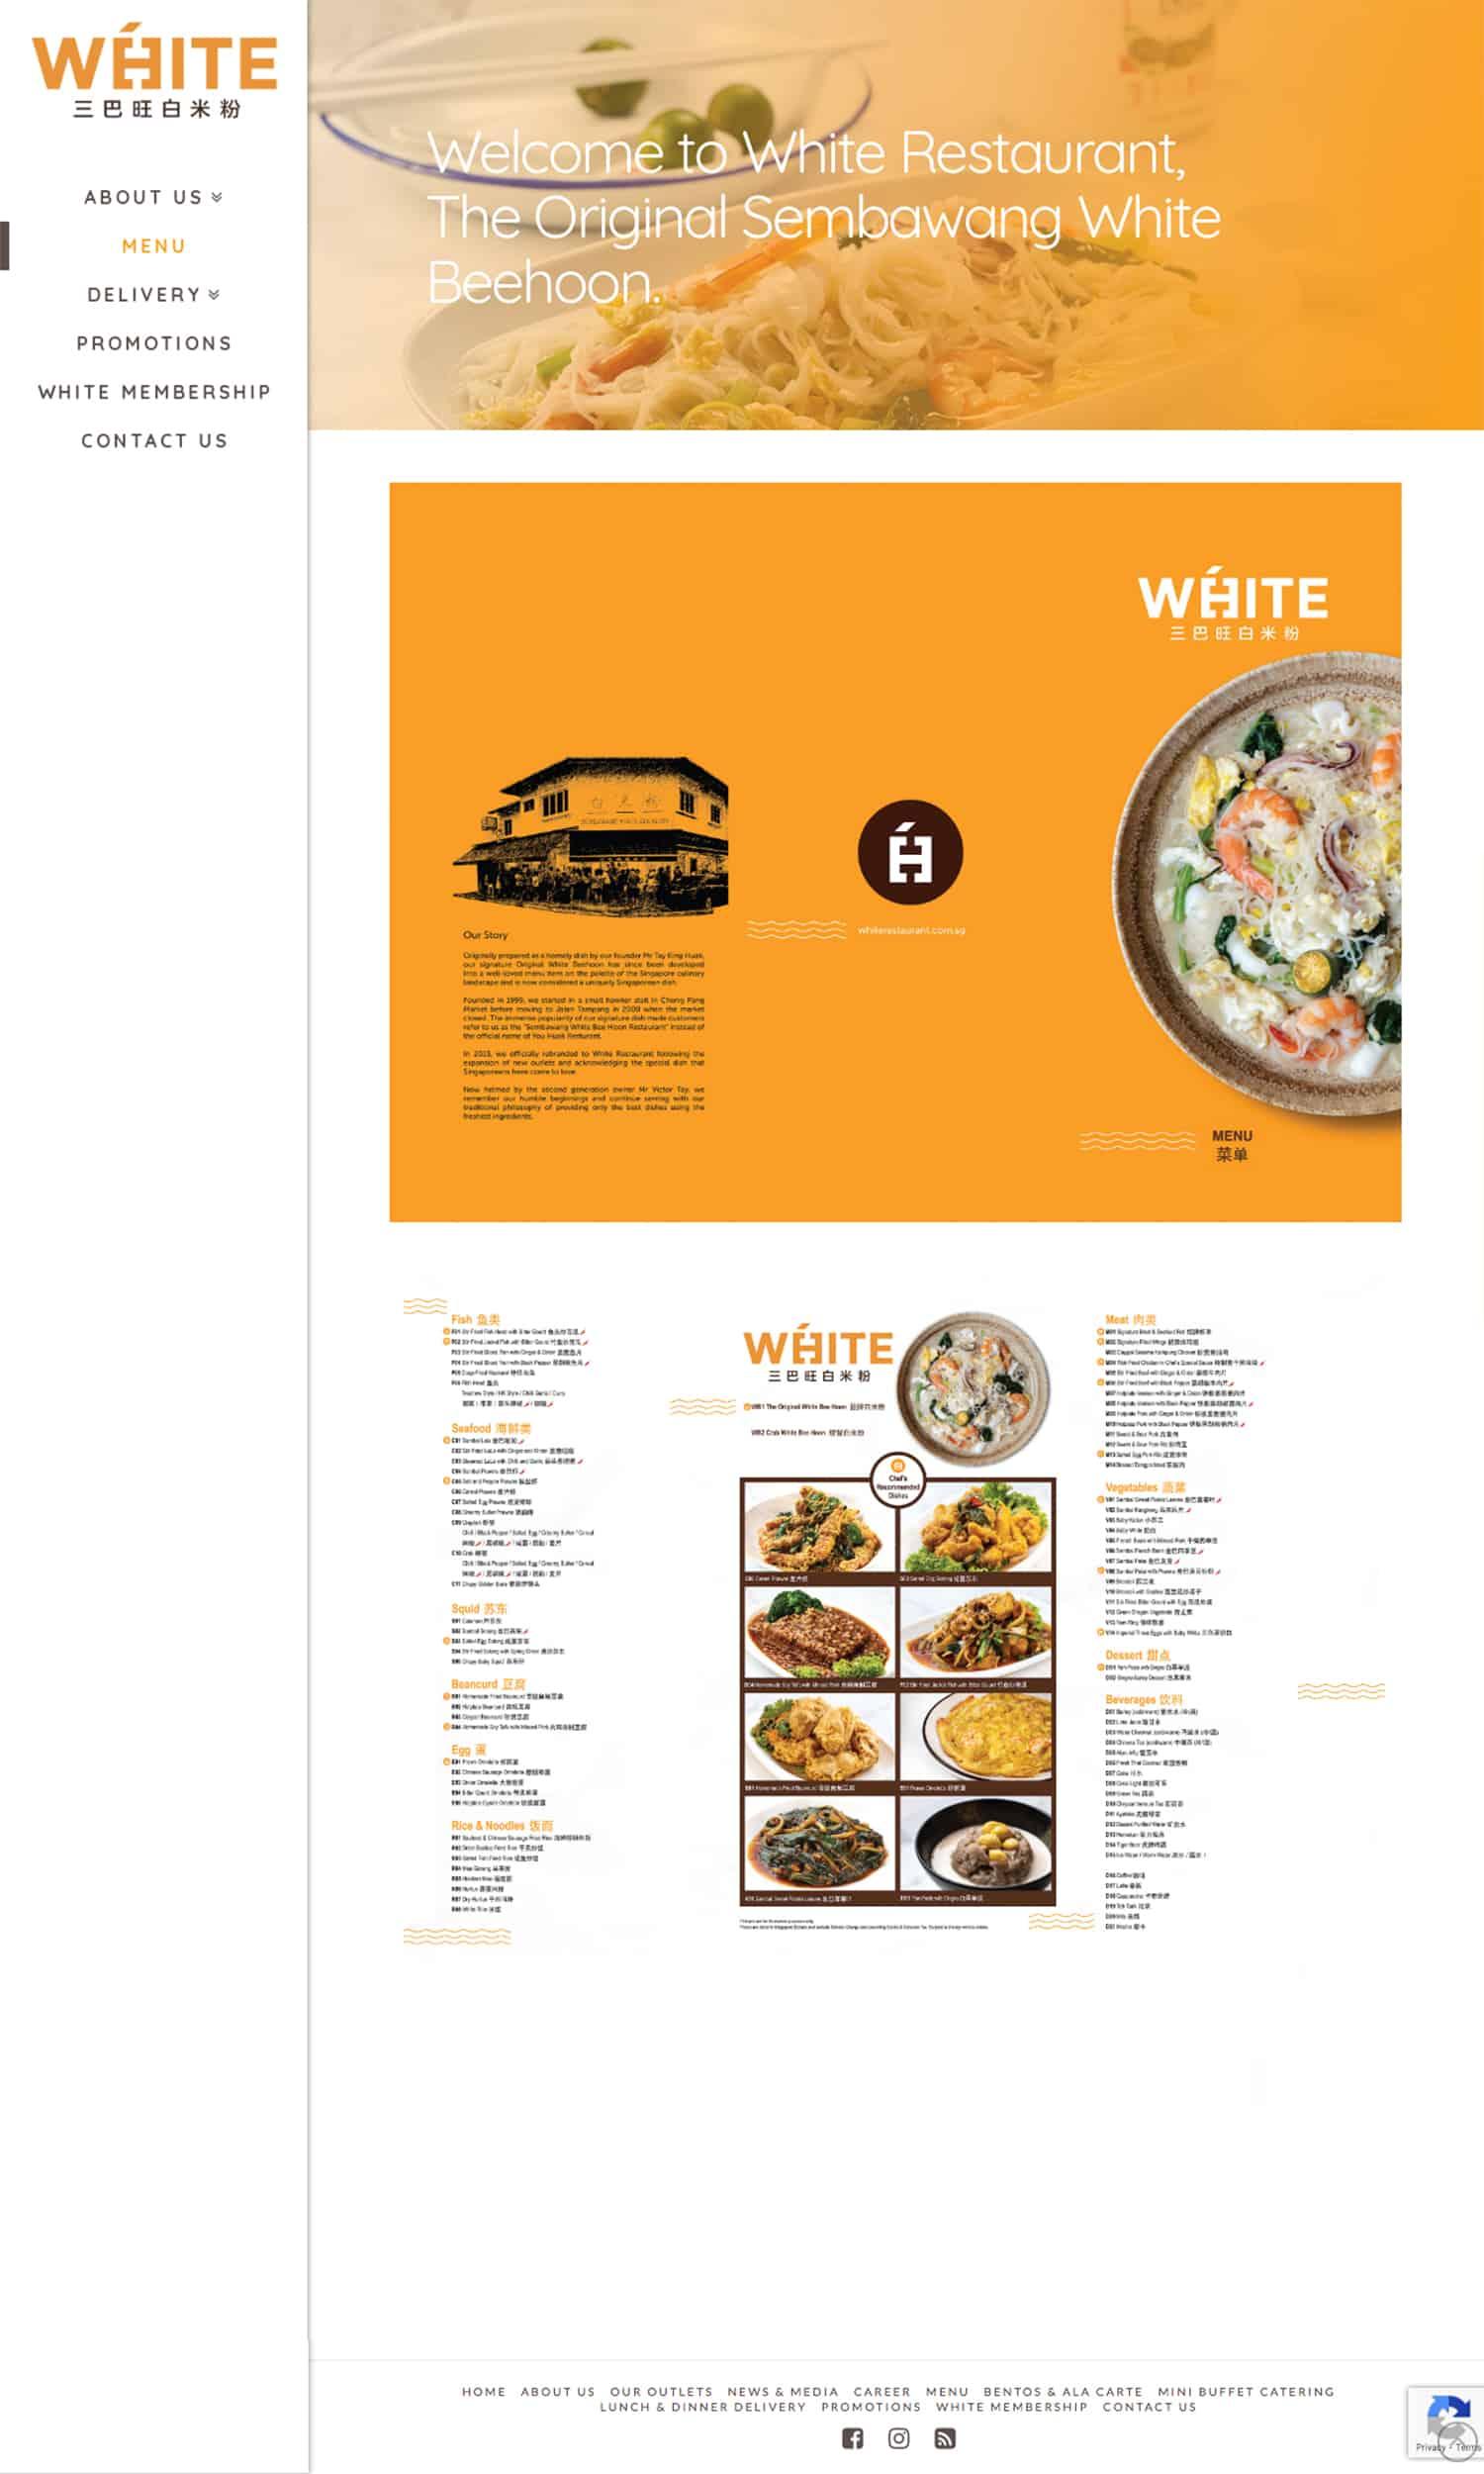 White Restaurant Page 2